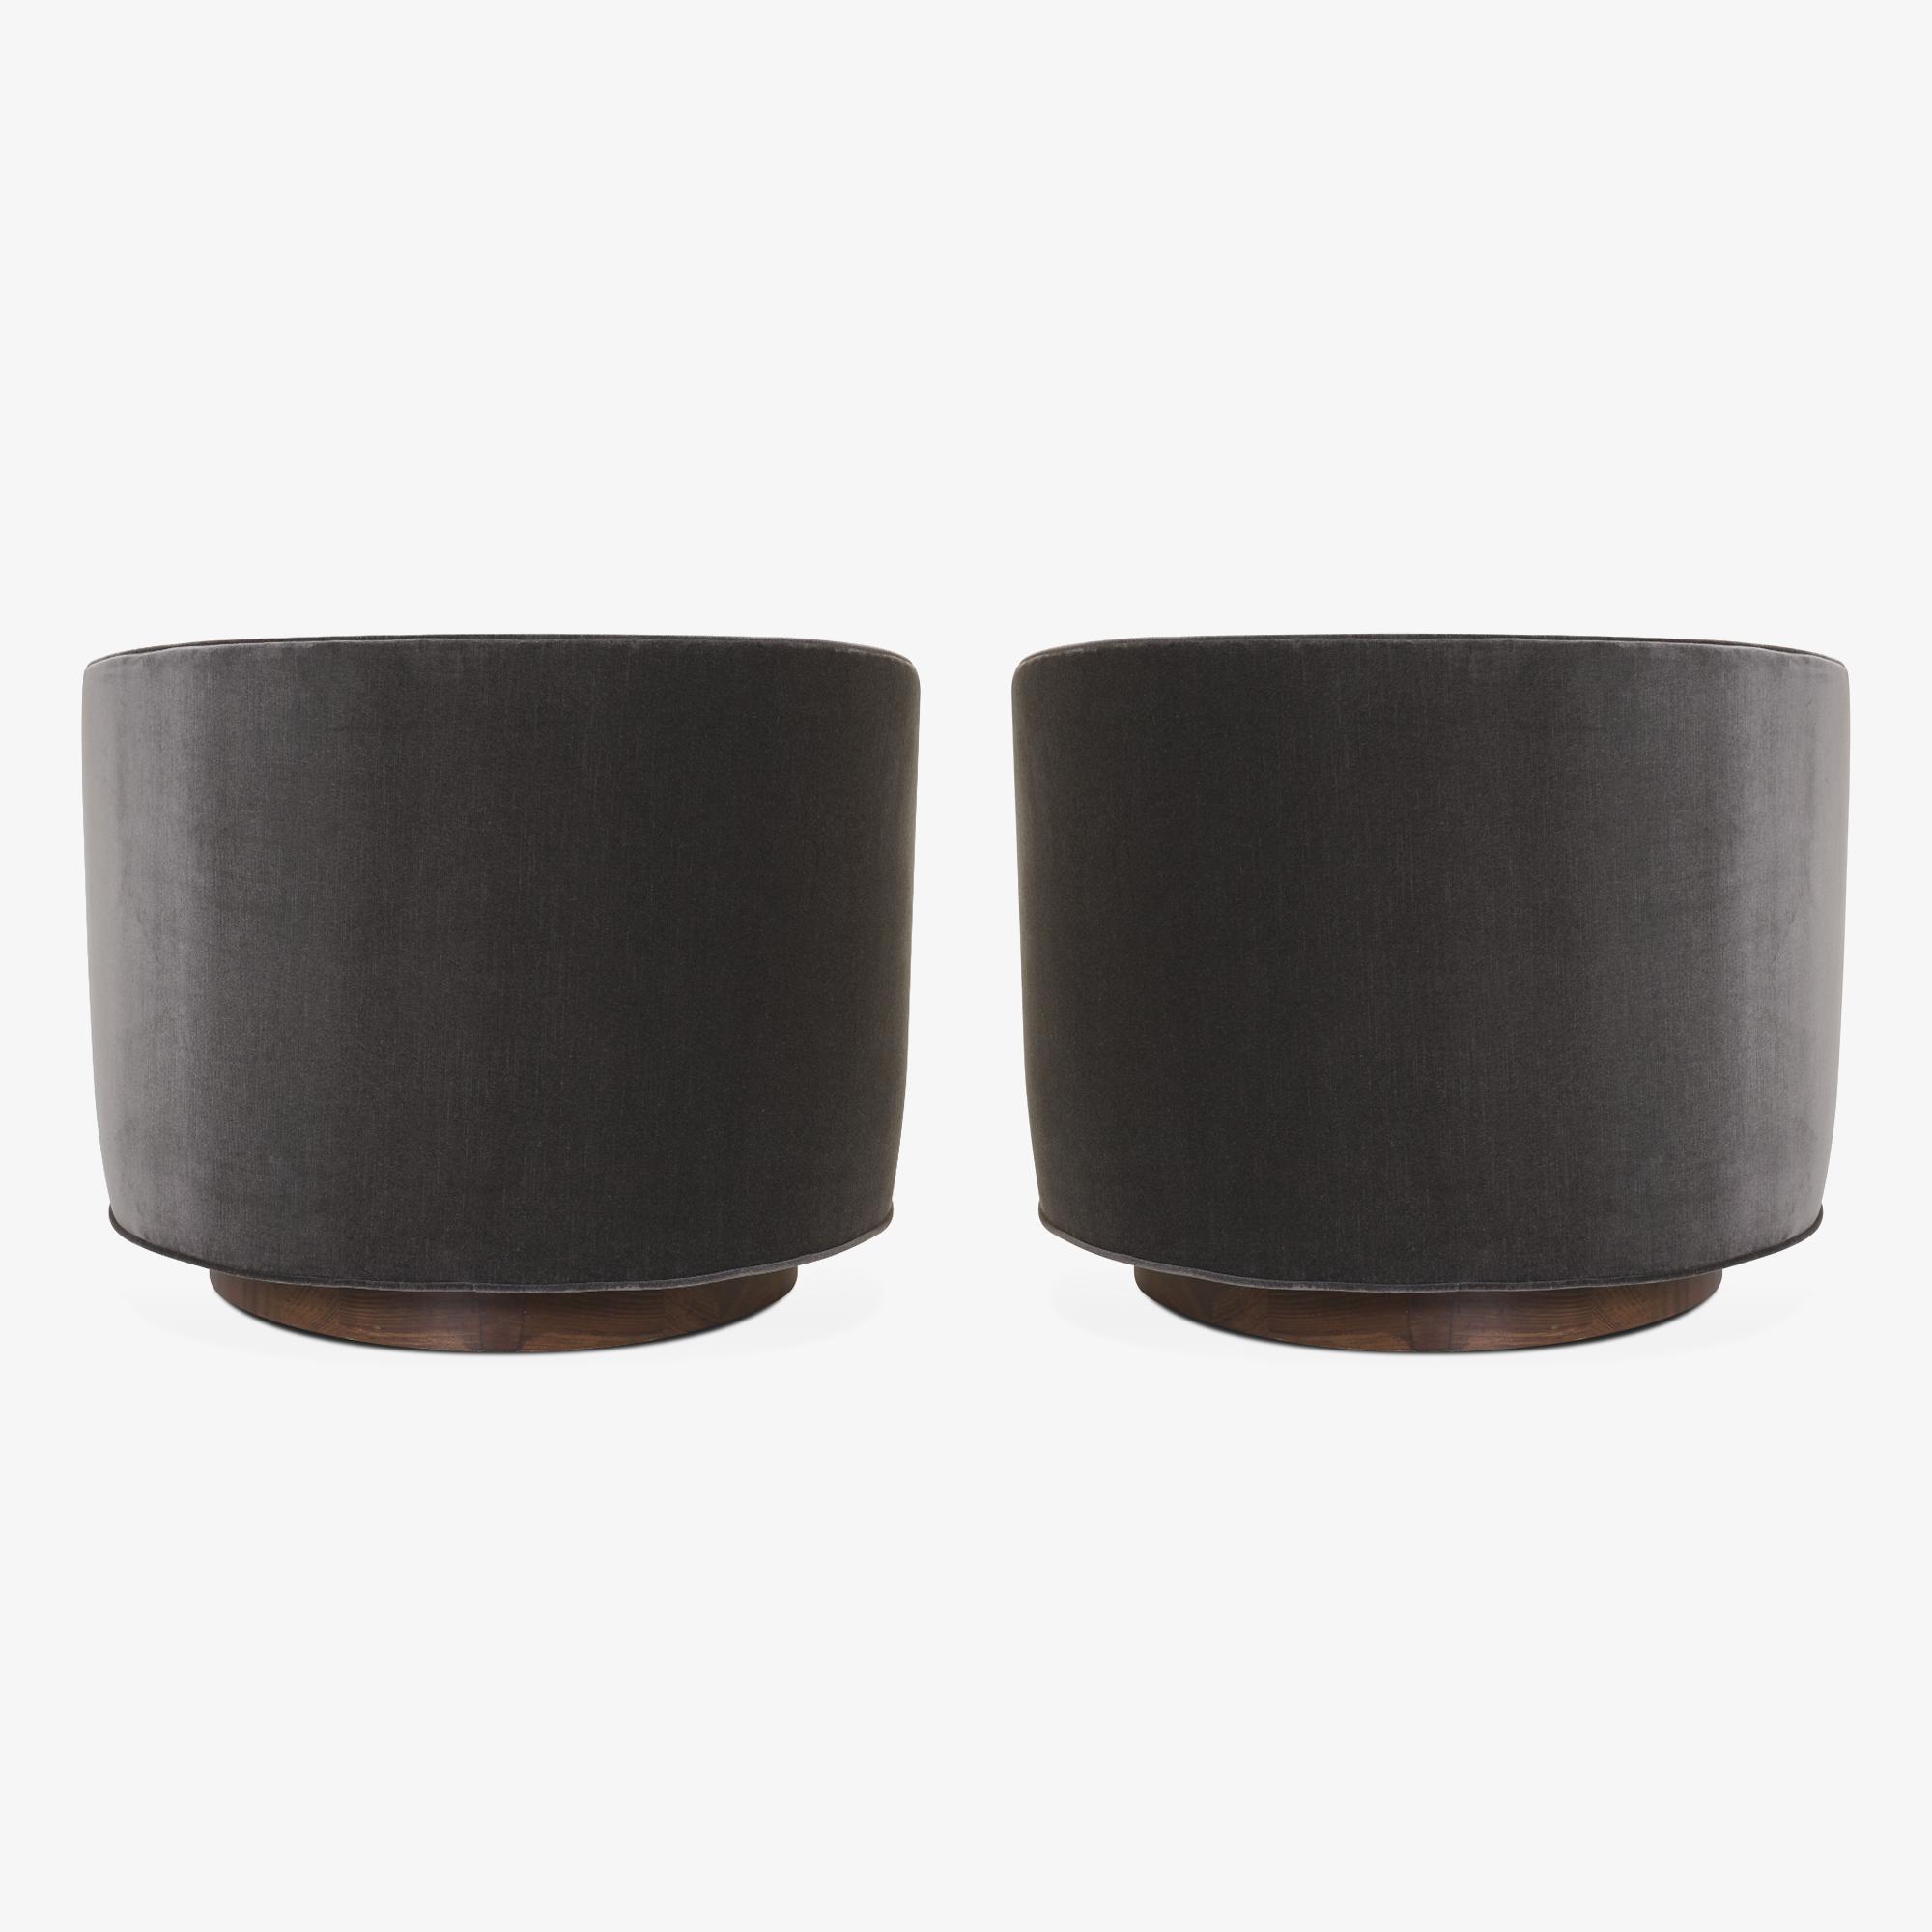 Swivel Tub Chairs in Shadow Velvet, Pair4.png